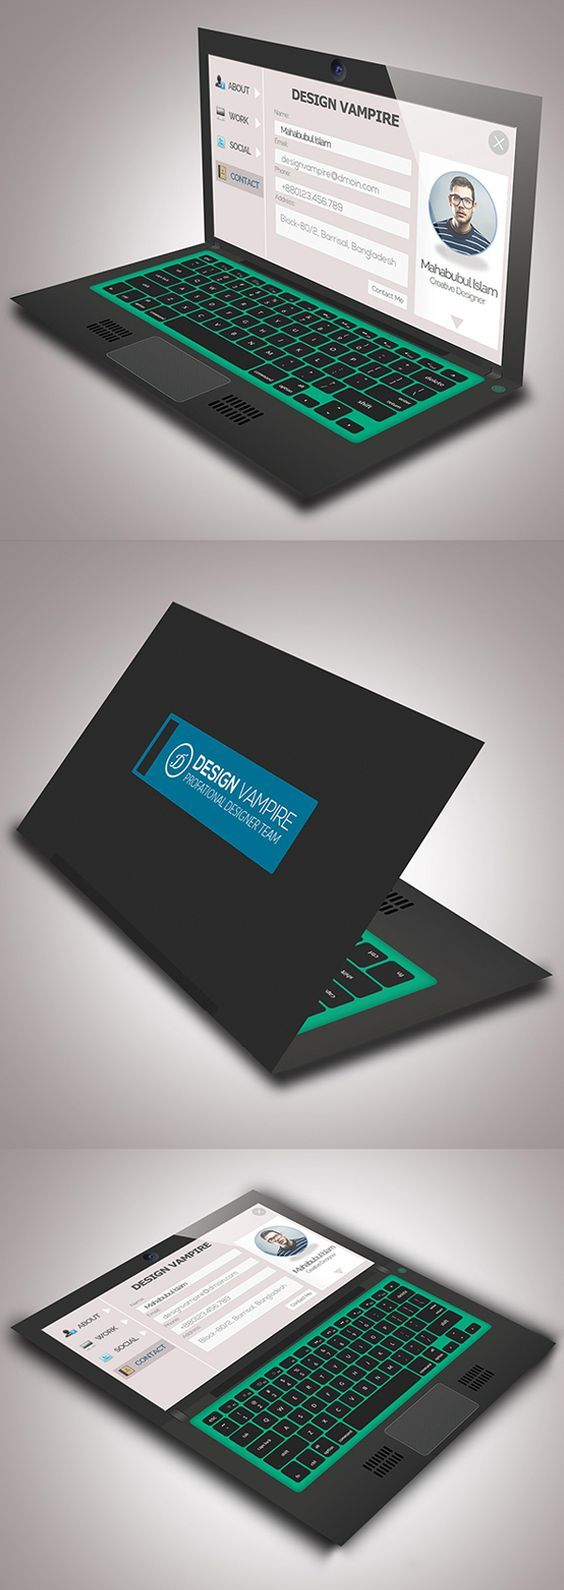 Laptop Business Card #businesscards #psdtemplates #visitingcard #corporatedesign...